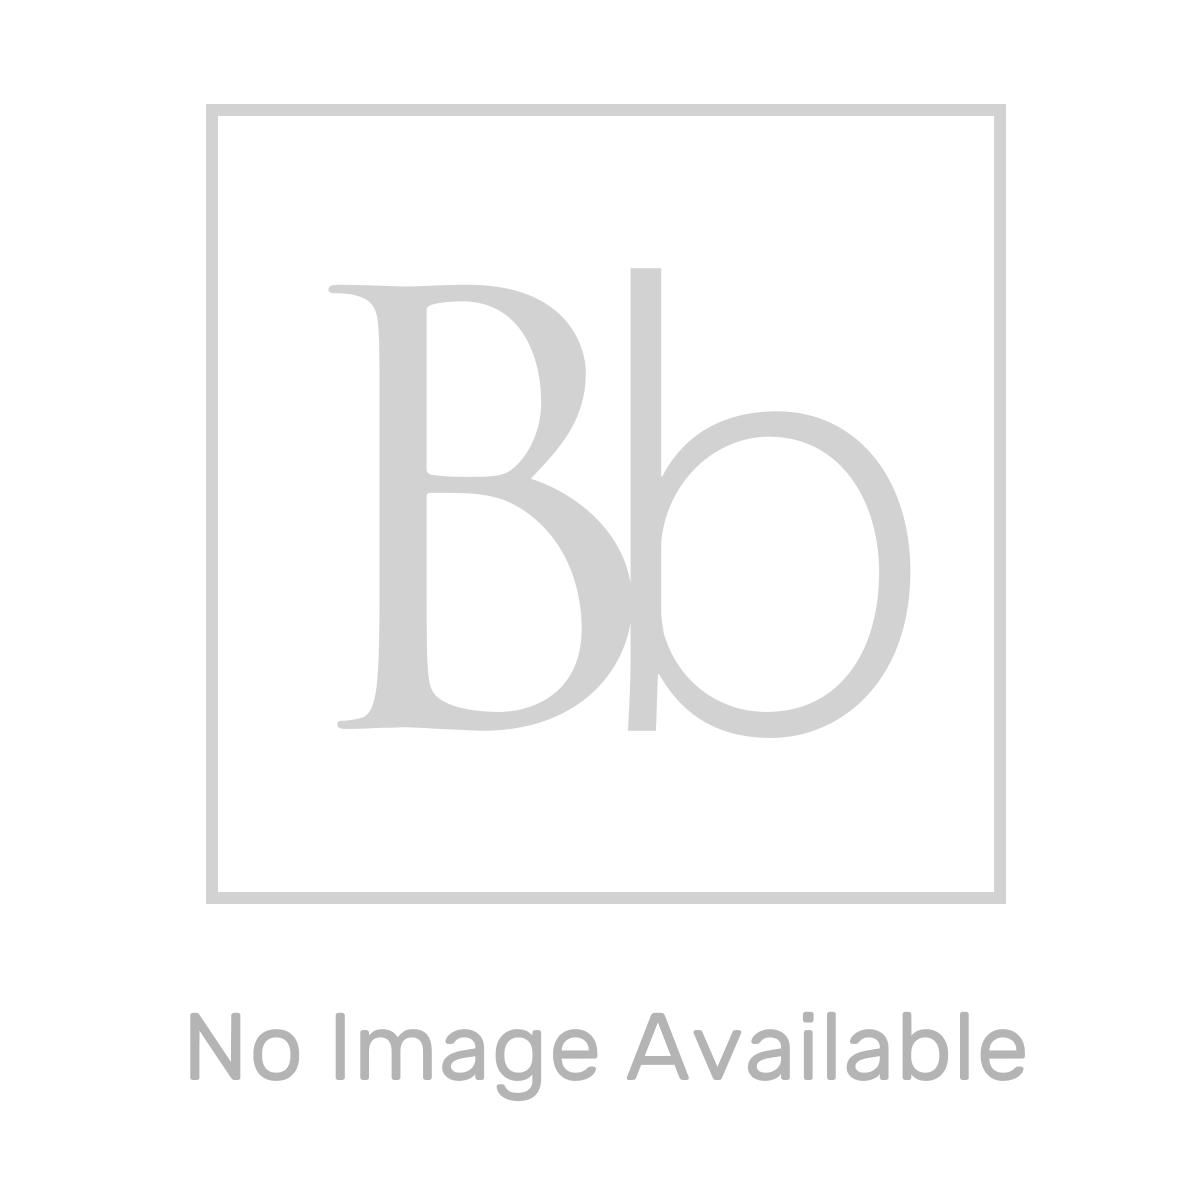 RAK Series 600 Shower Bath Suite